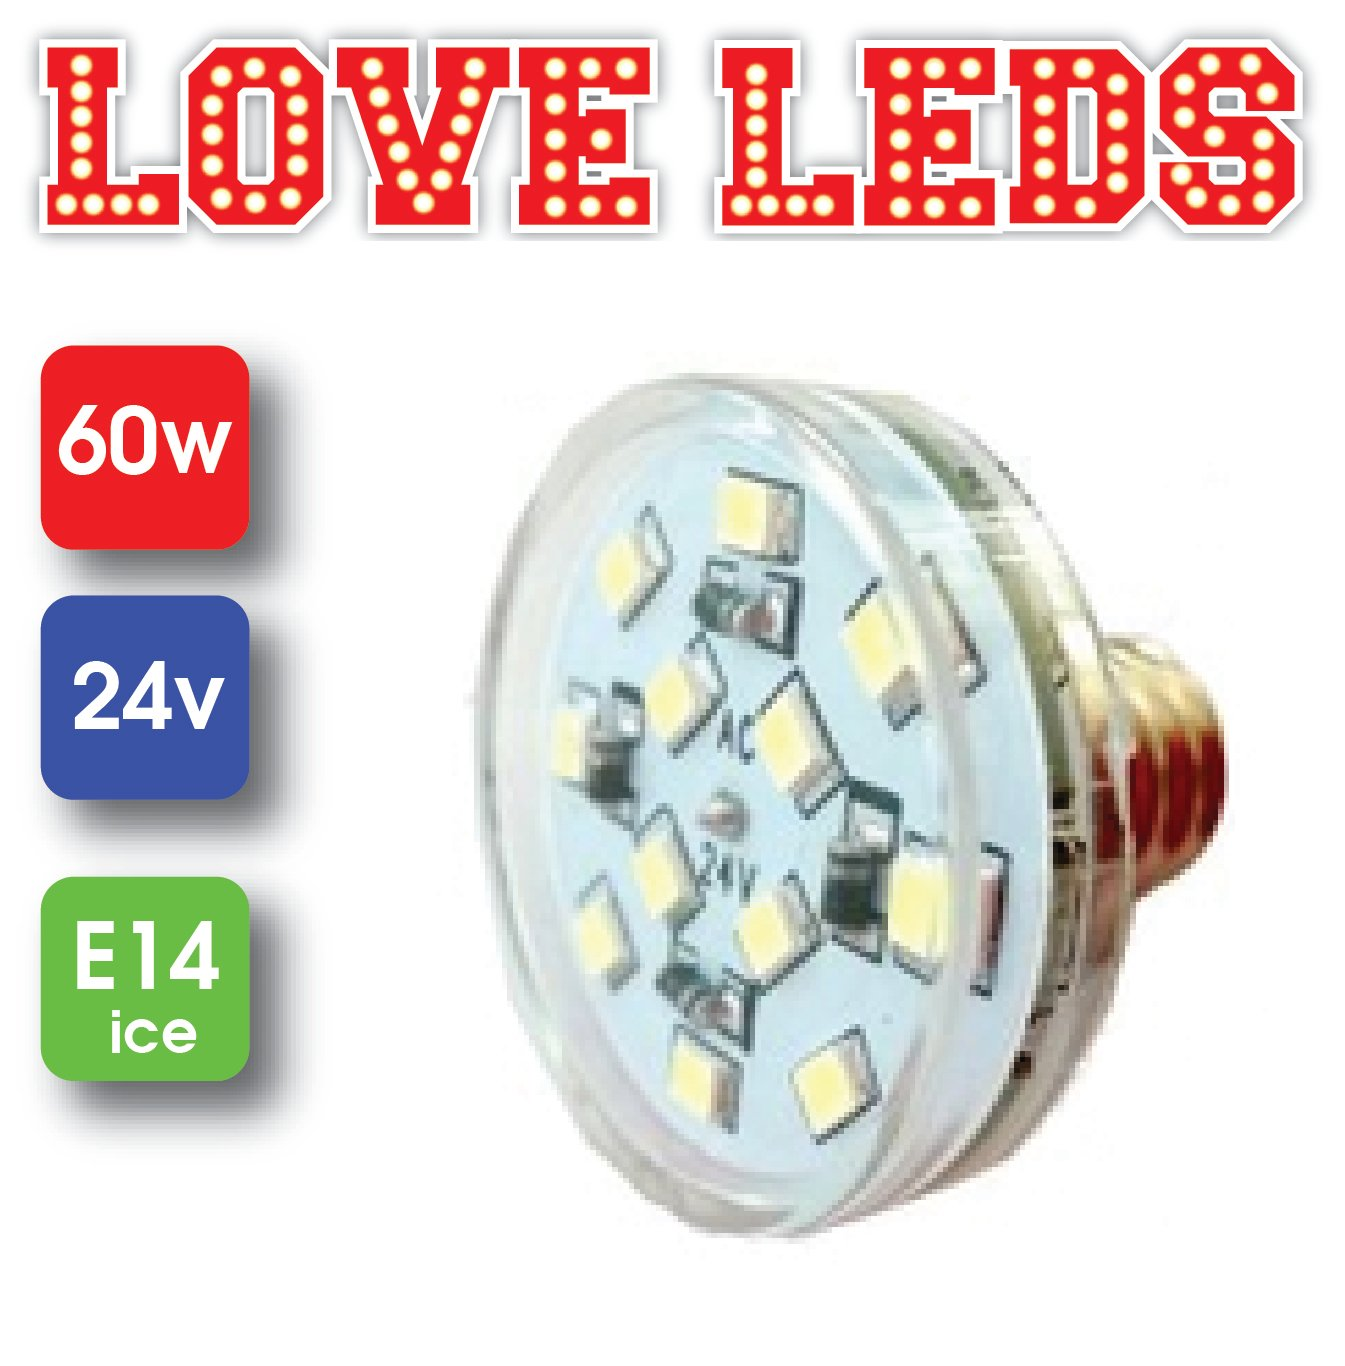 E14 16 LED Module 24v